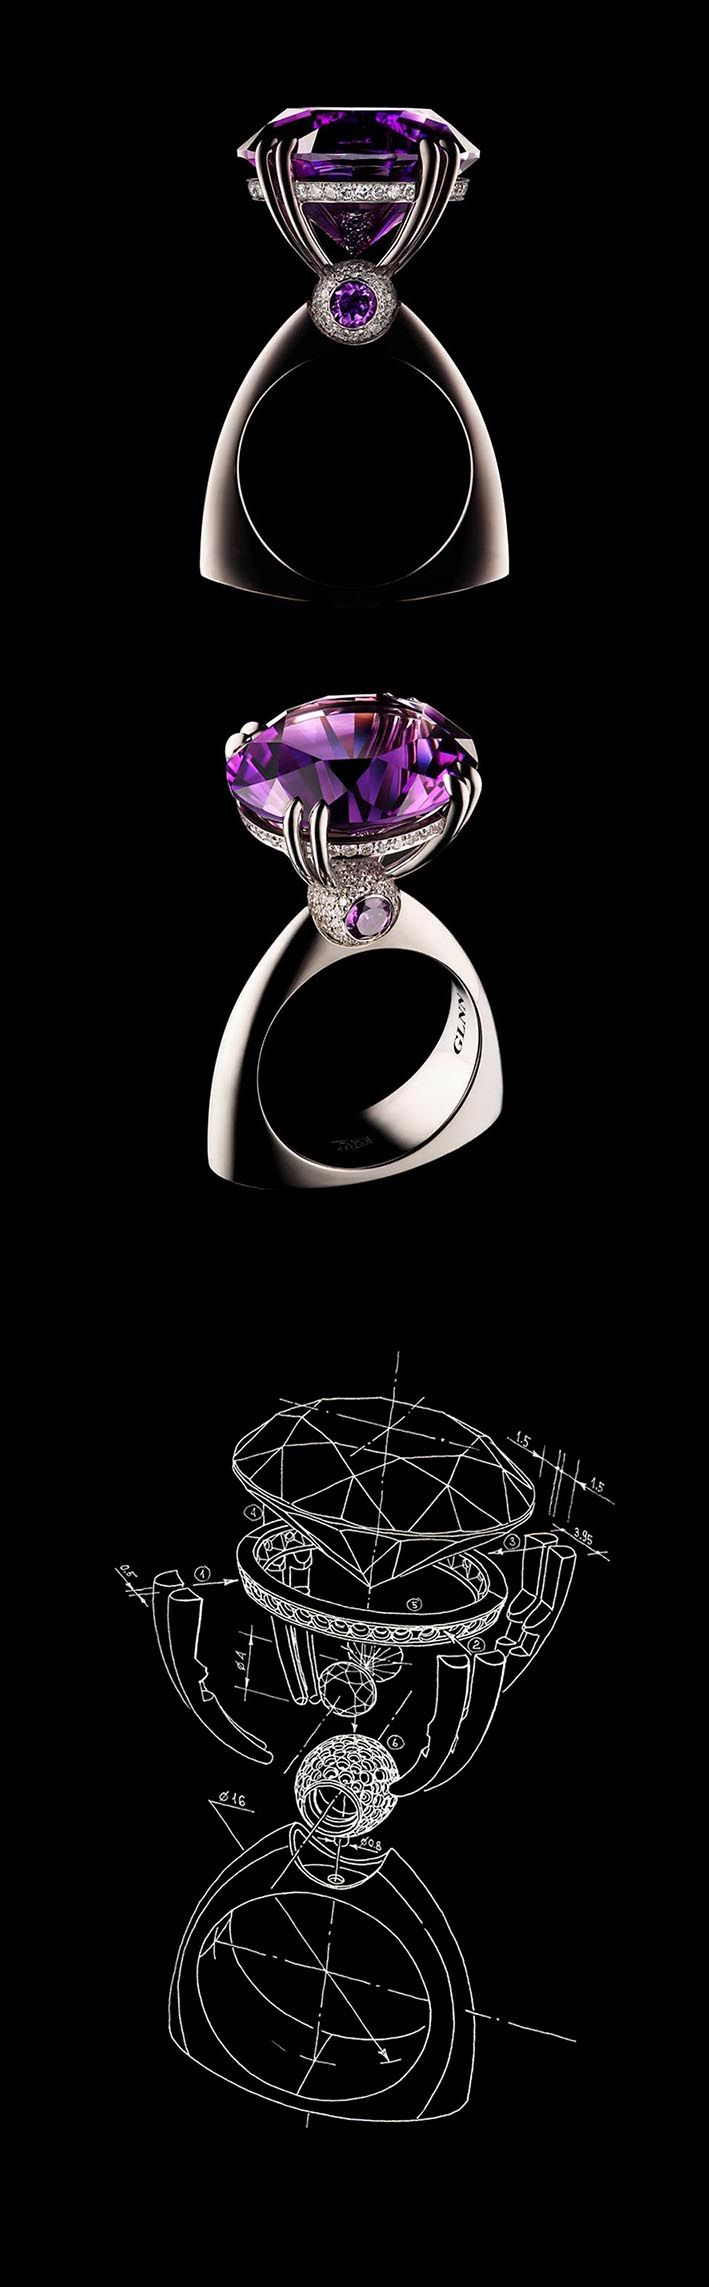 "VLAD GLYNIN jewellery - Ring ""The Eye of Providence"", 2014. White gold, amethyst, diamonds. / Кольцо ""Всевидящее"", 2014 г. Белое золото, аметист, бриллианты. / Anello ""Della Provvidenza"", 2014. Oro bianco, ametista, diamanti."